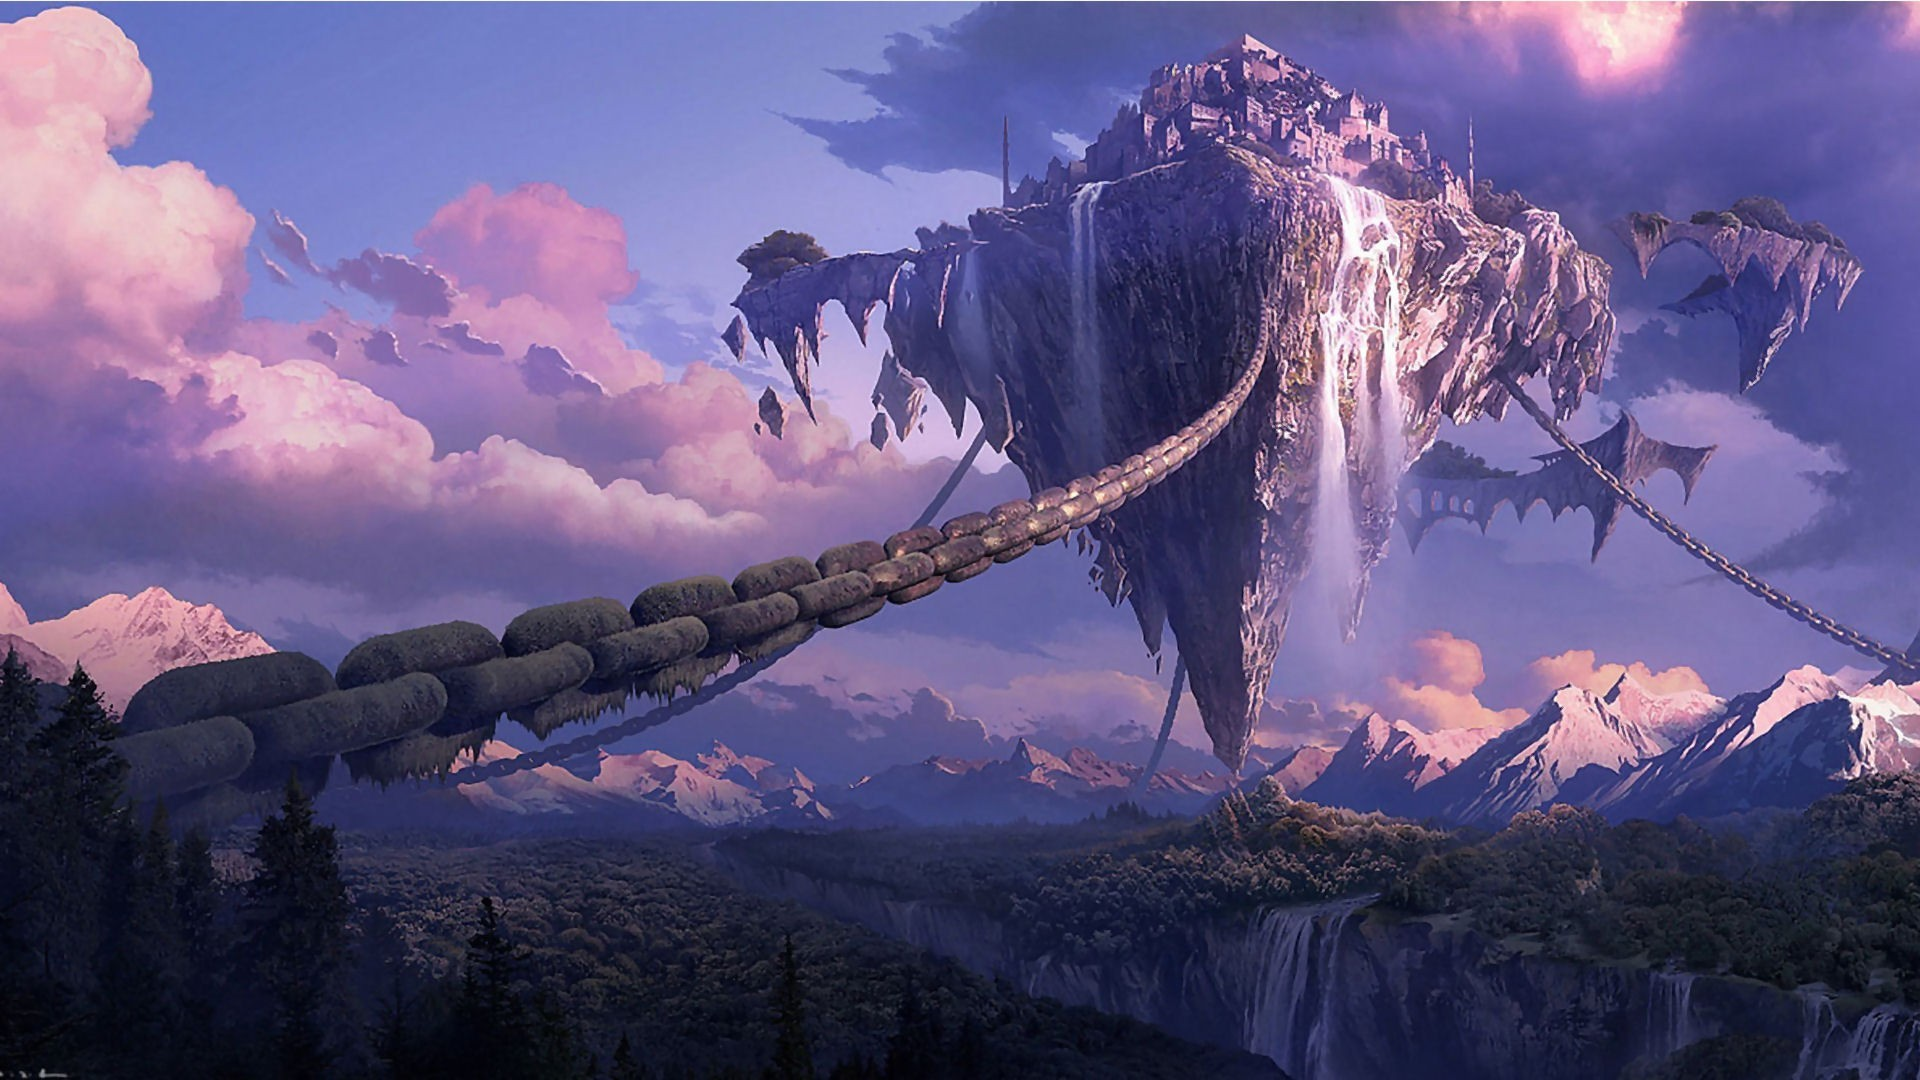 anime-fantasy-landscape-wallpapers-background.jpg (1920×1080) | cyber anime  japan | Pinterest | Landscape wallpaper, Fantasy landscape and Wallpaper